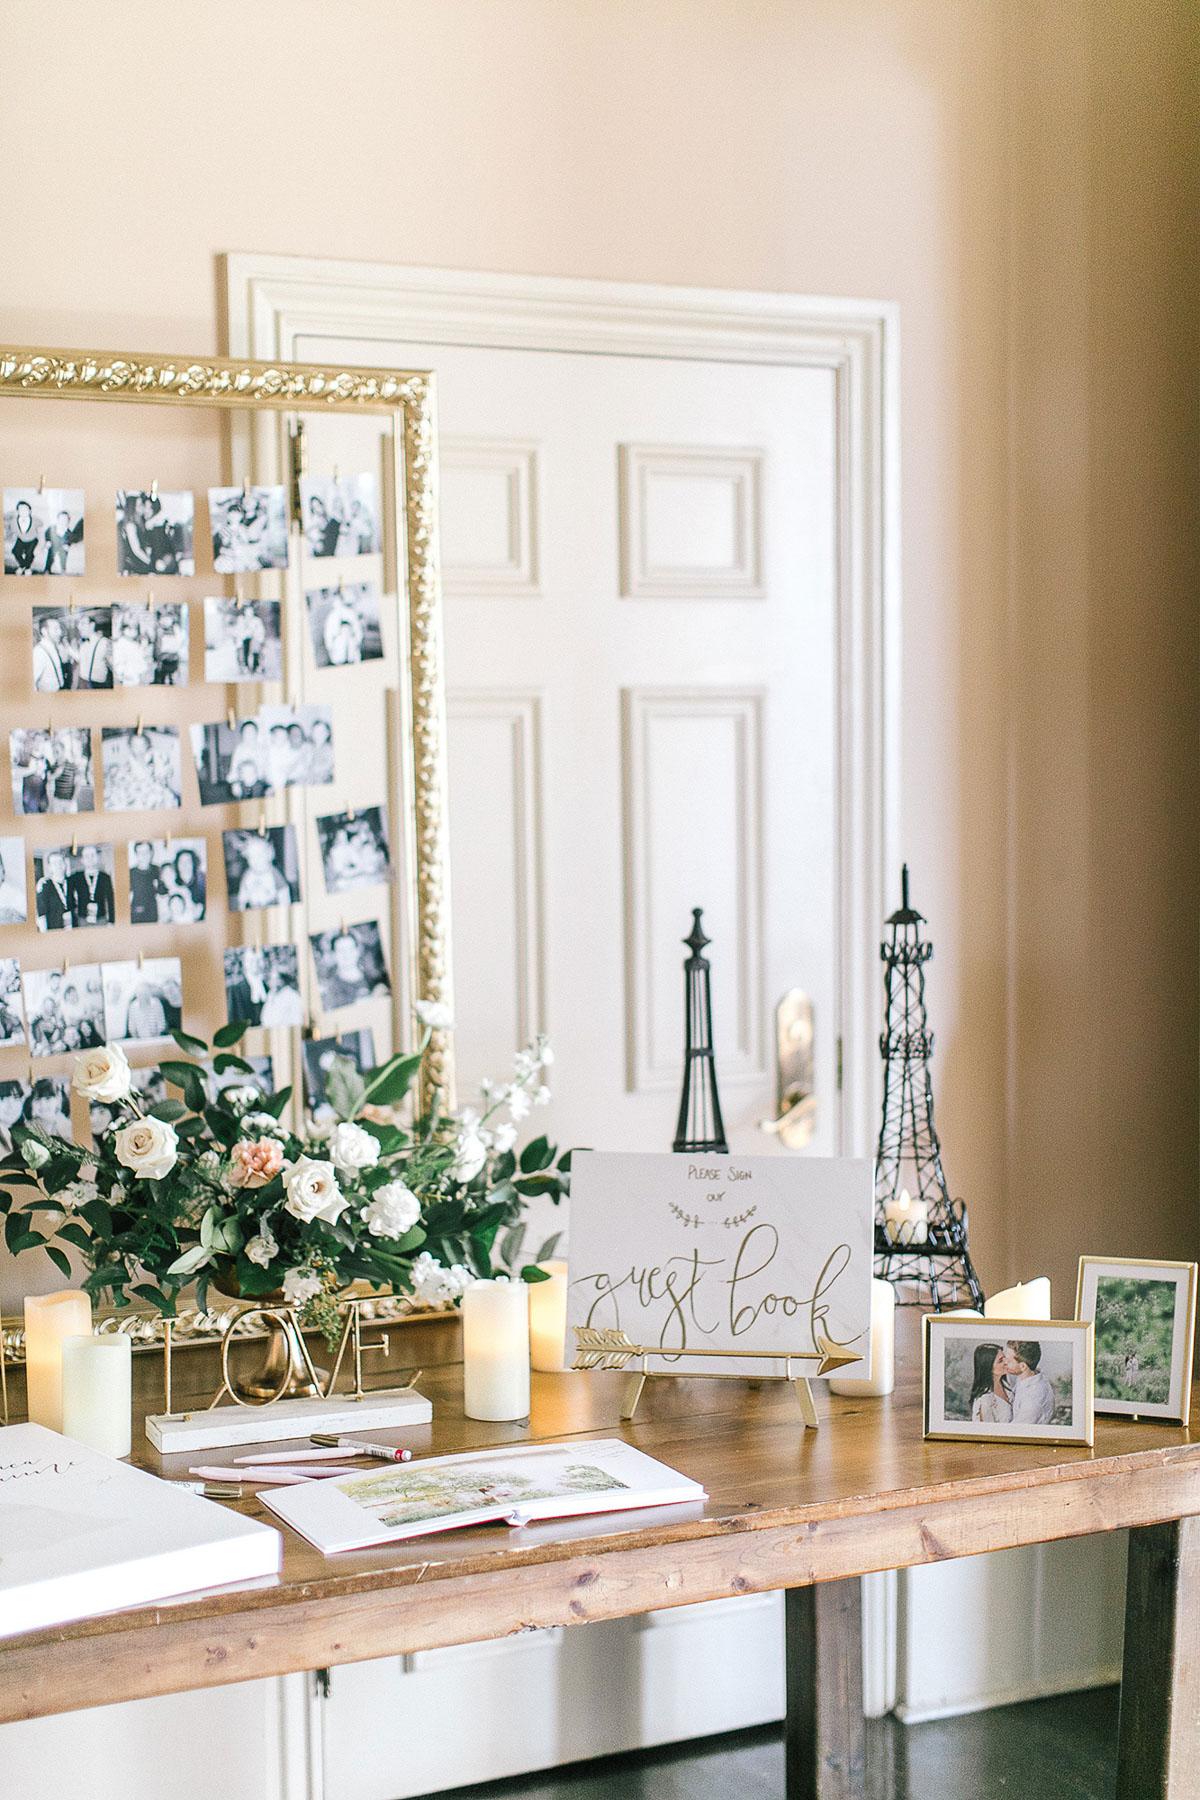 tamara-lockwood-photography-vineyard-bride-swish-list-the-old-courthouse-niagara-on-the-lake-wedding-45.jpg